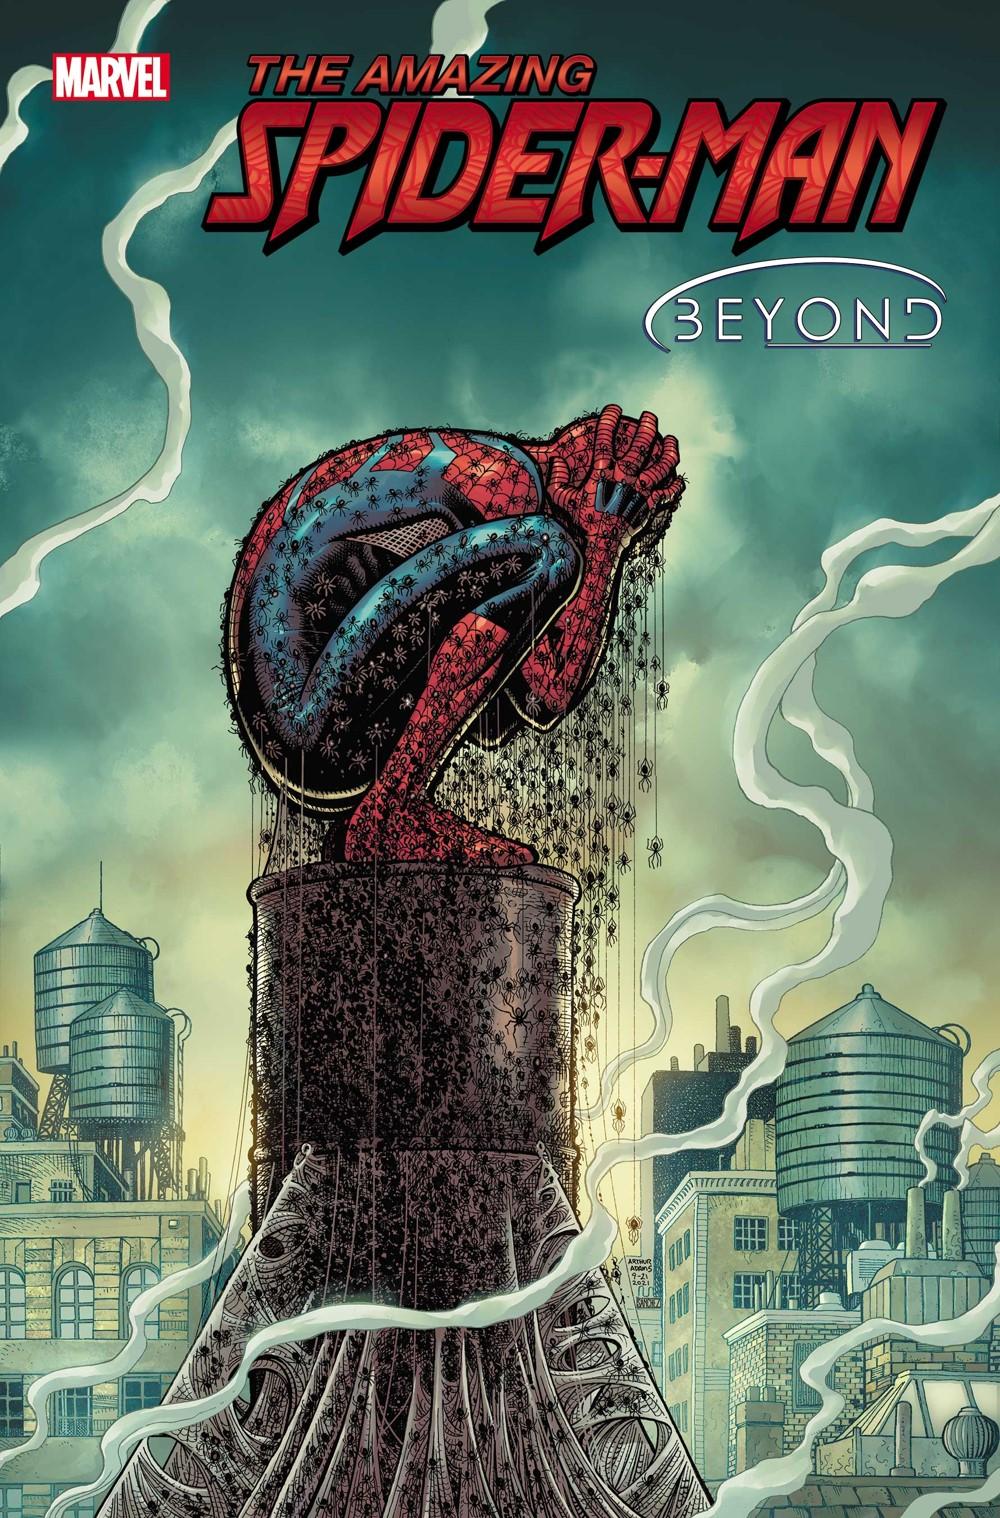 ASM2018086_cov Ben Reilly is devastated by Doctor Octopus in AMAZING SPIDER-MAN #85